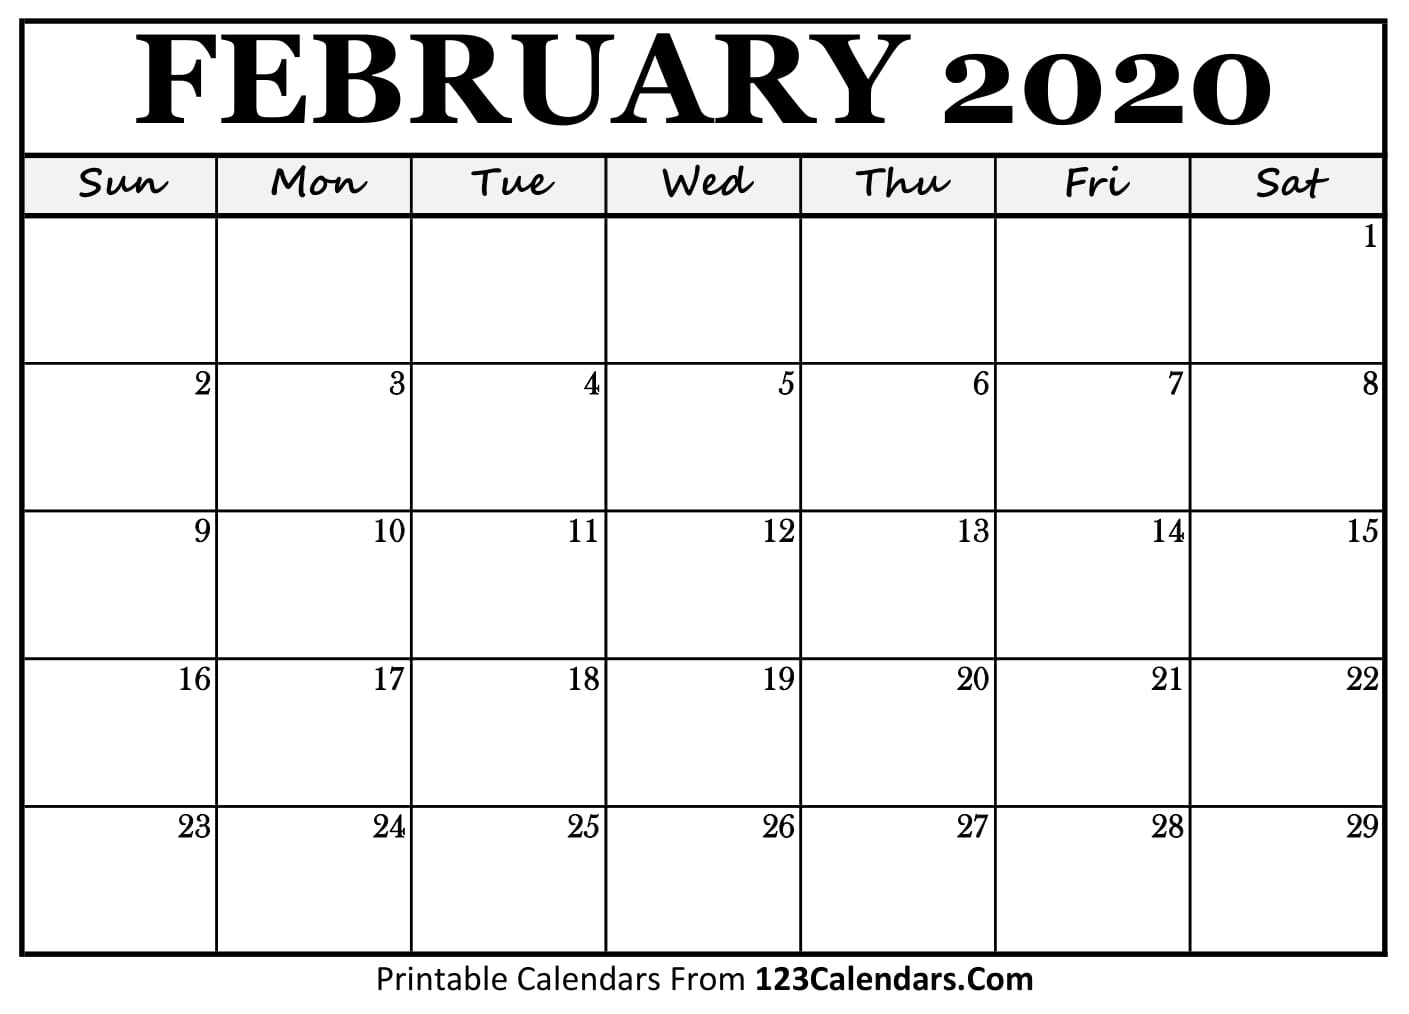 February 2020 Printable Calendar | 123Calendars – Calendar with 123 Calendars December 2020